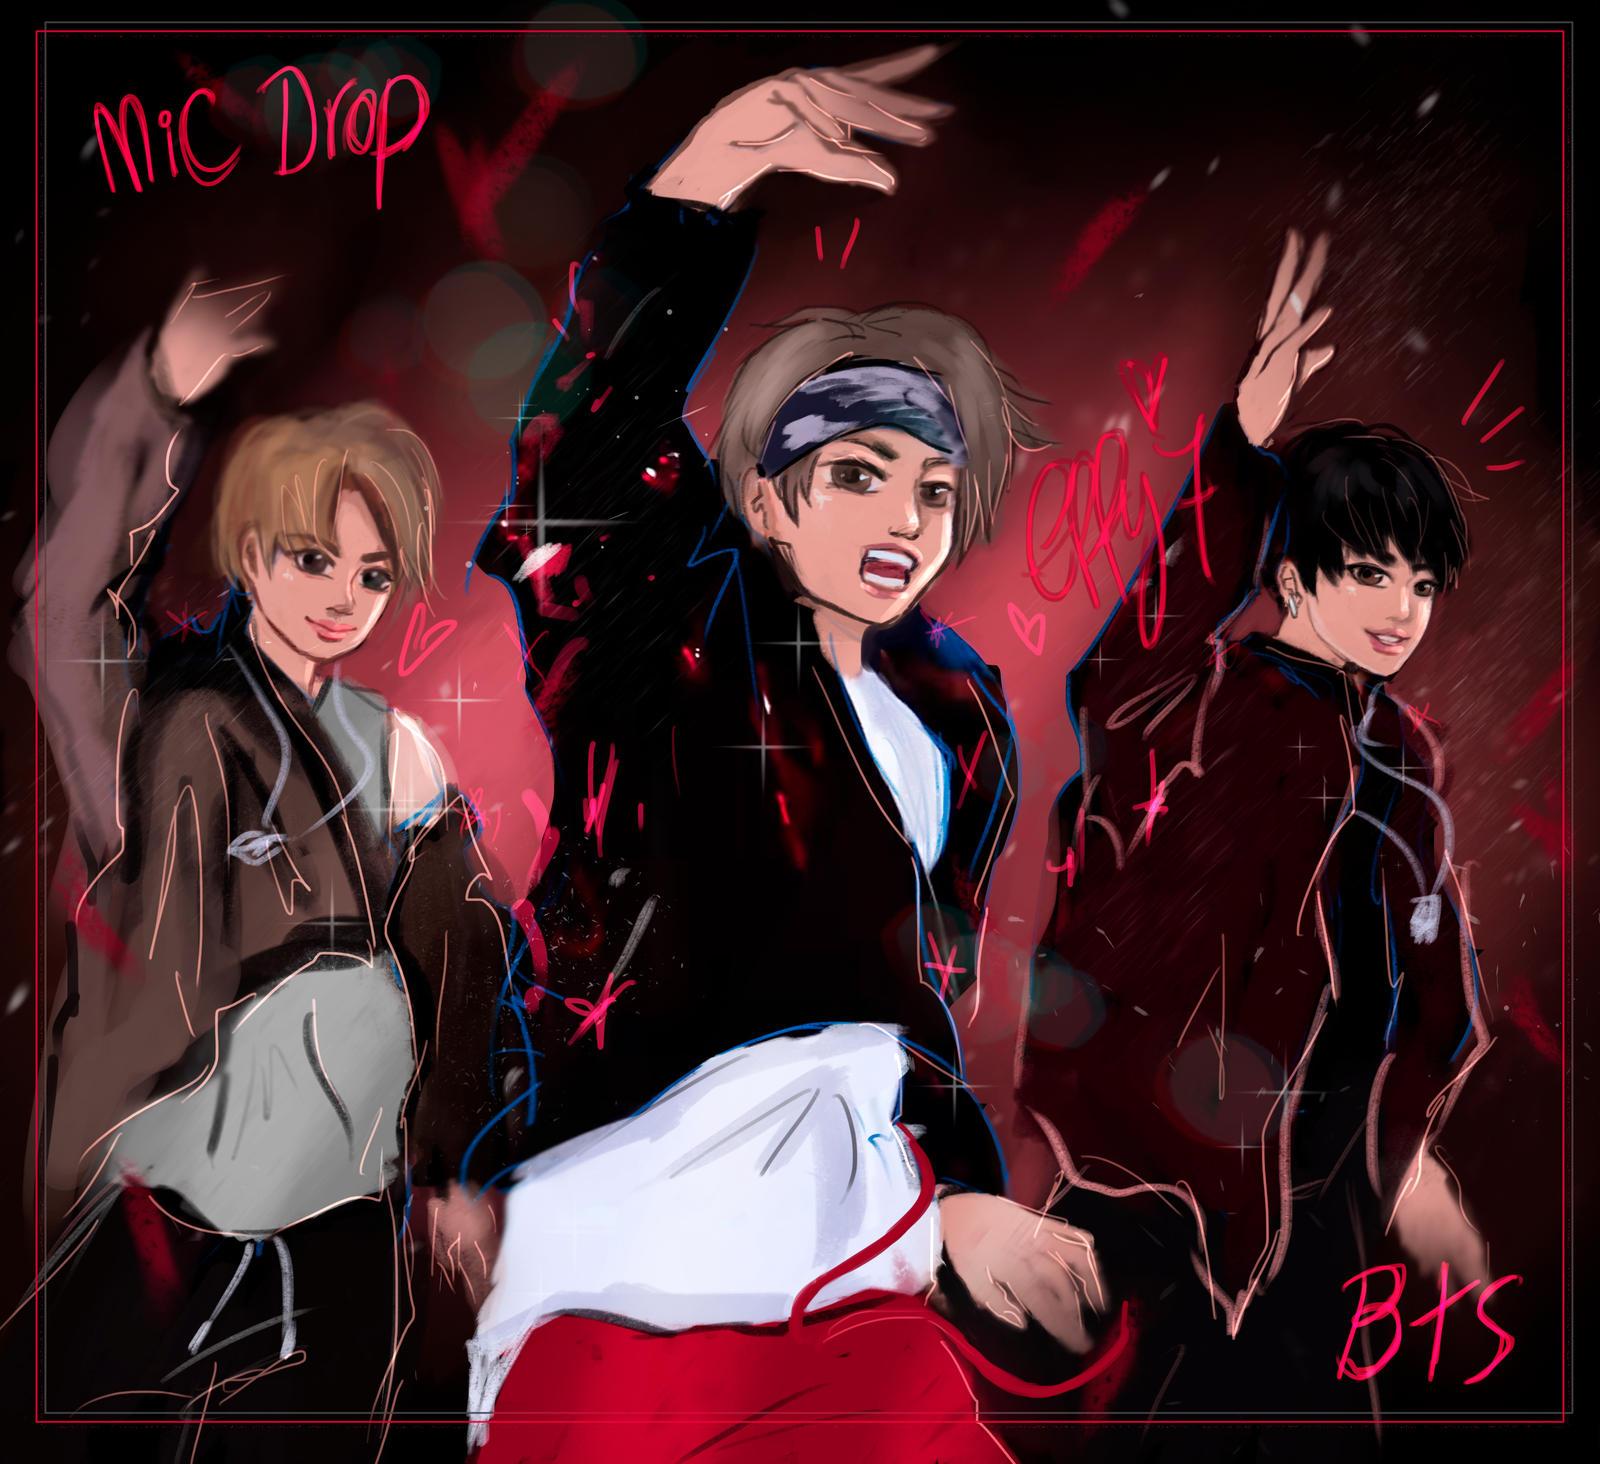 bts   mic drop by effy7 dbuqphl